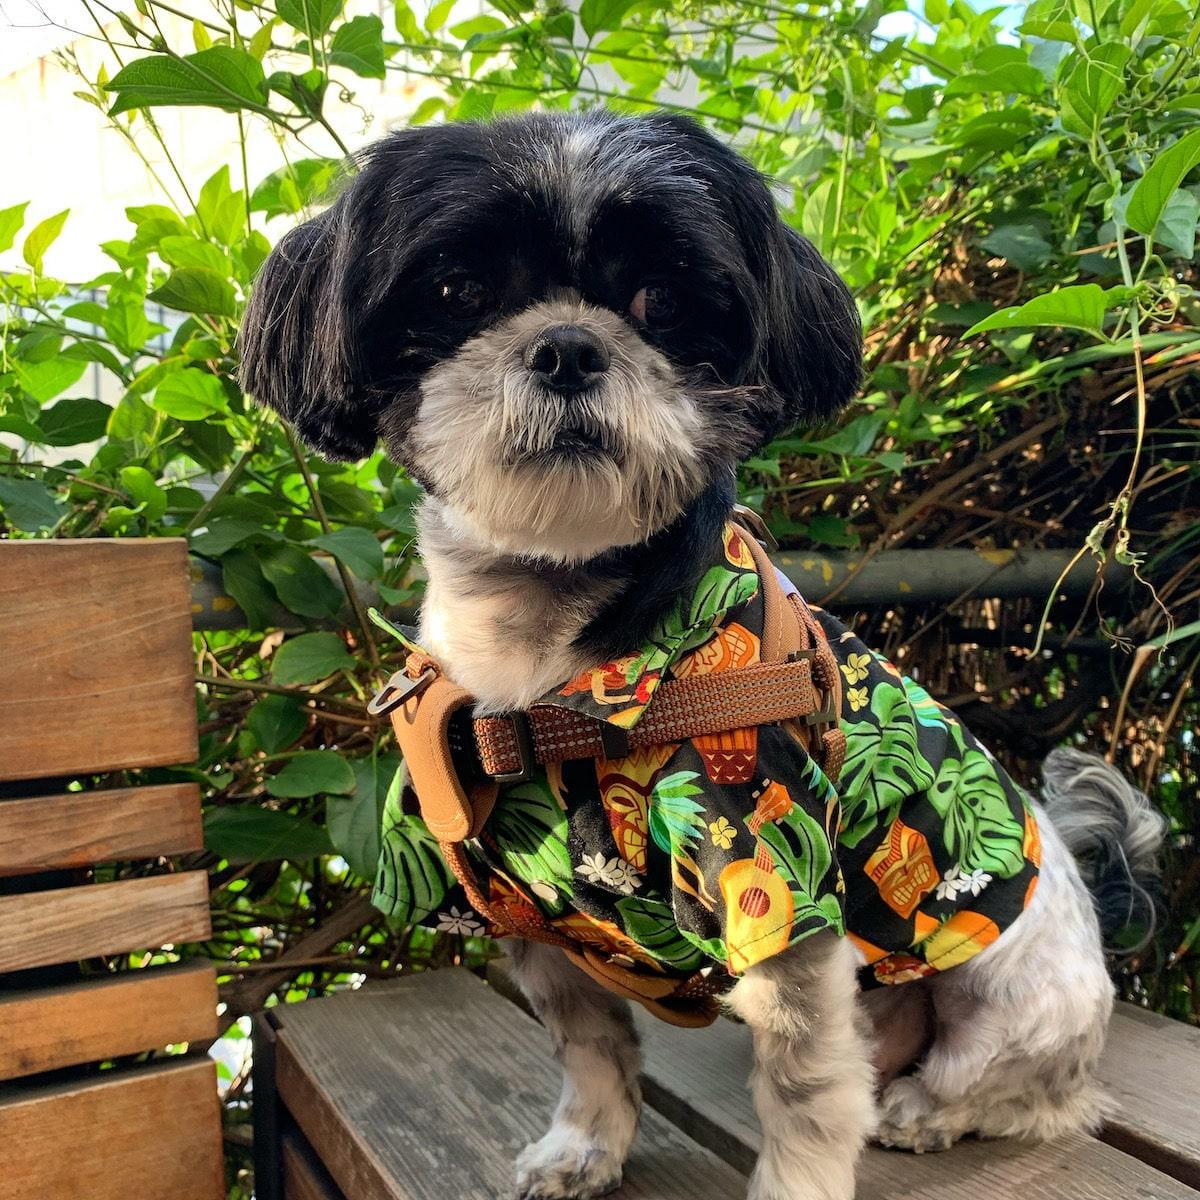 Dog Hawaiian shirt from Chompers & Sons